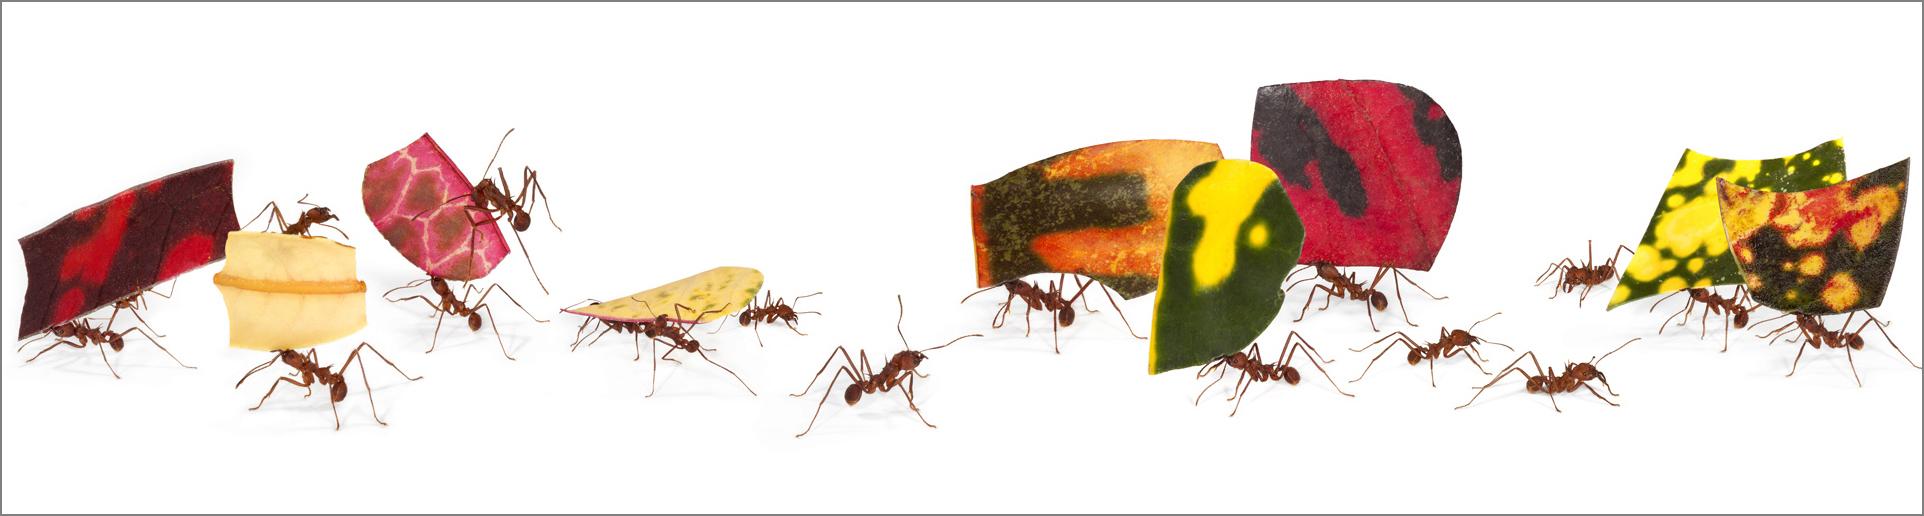 antworks_parade_4g.jpg